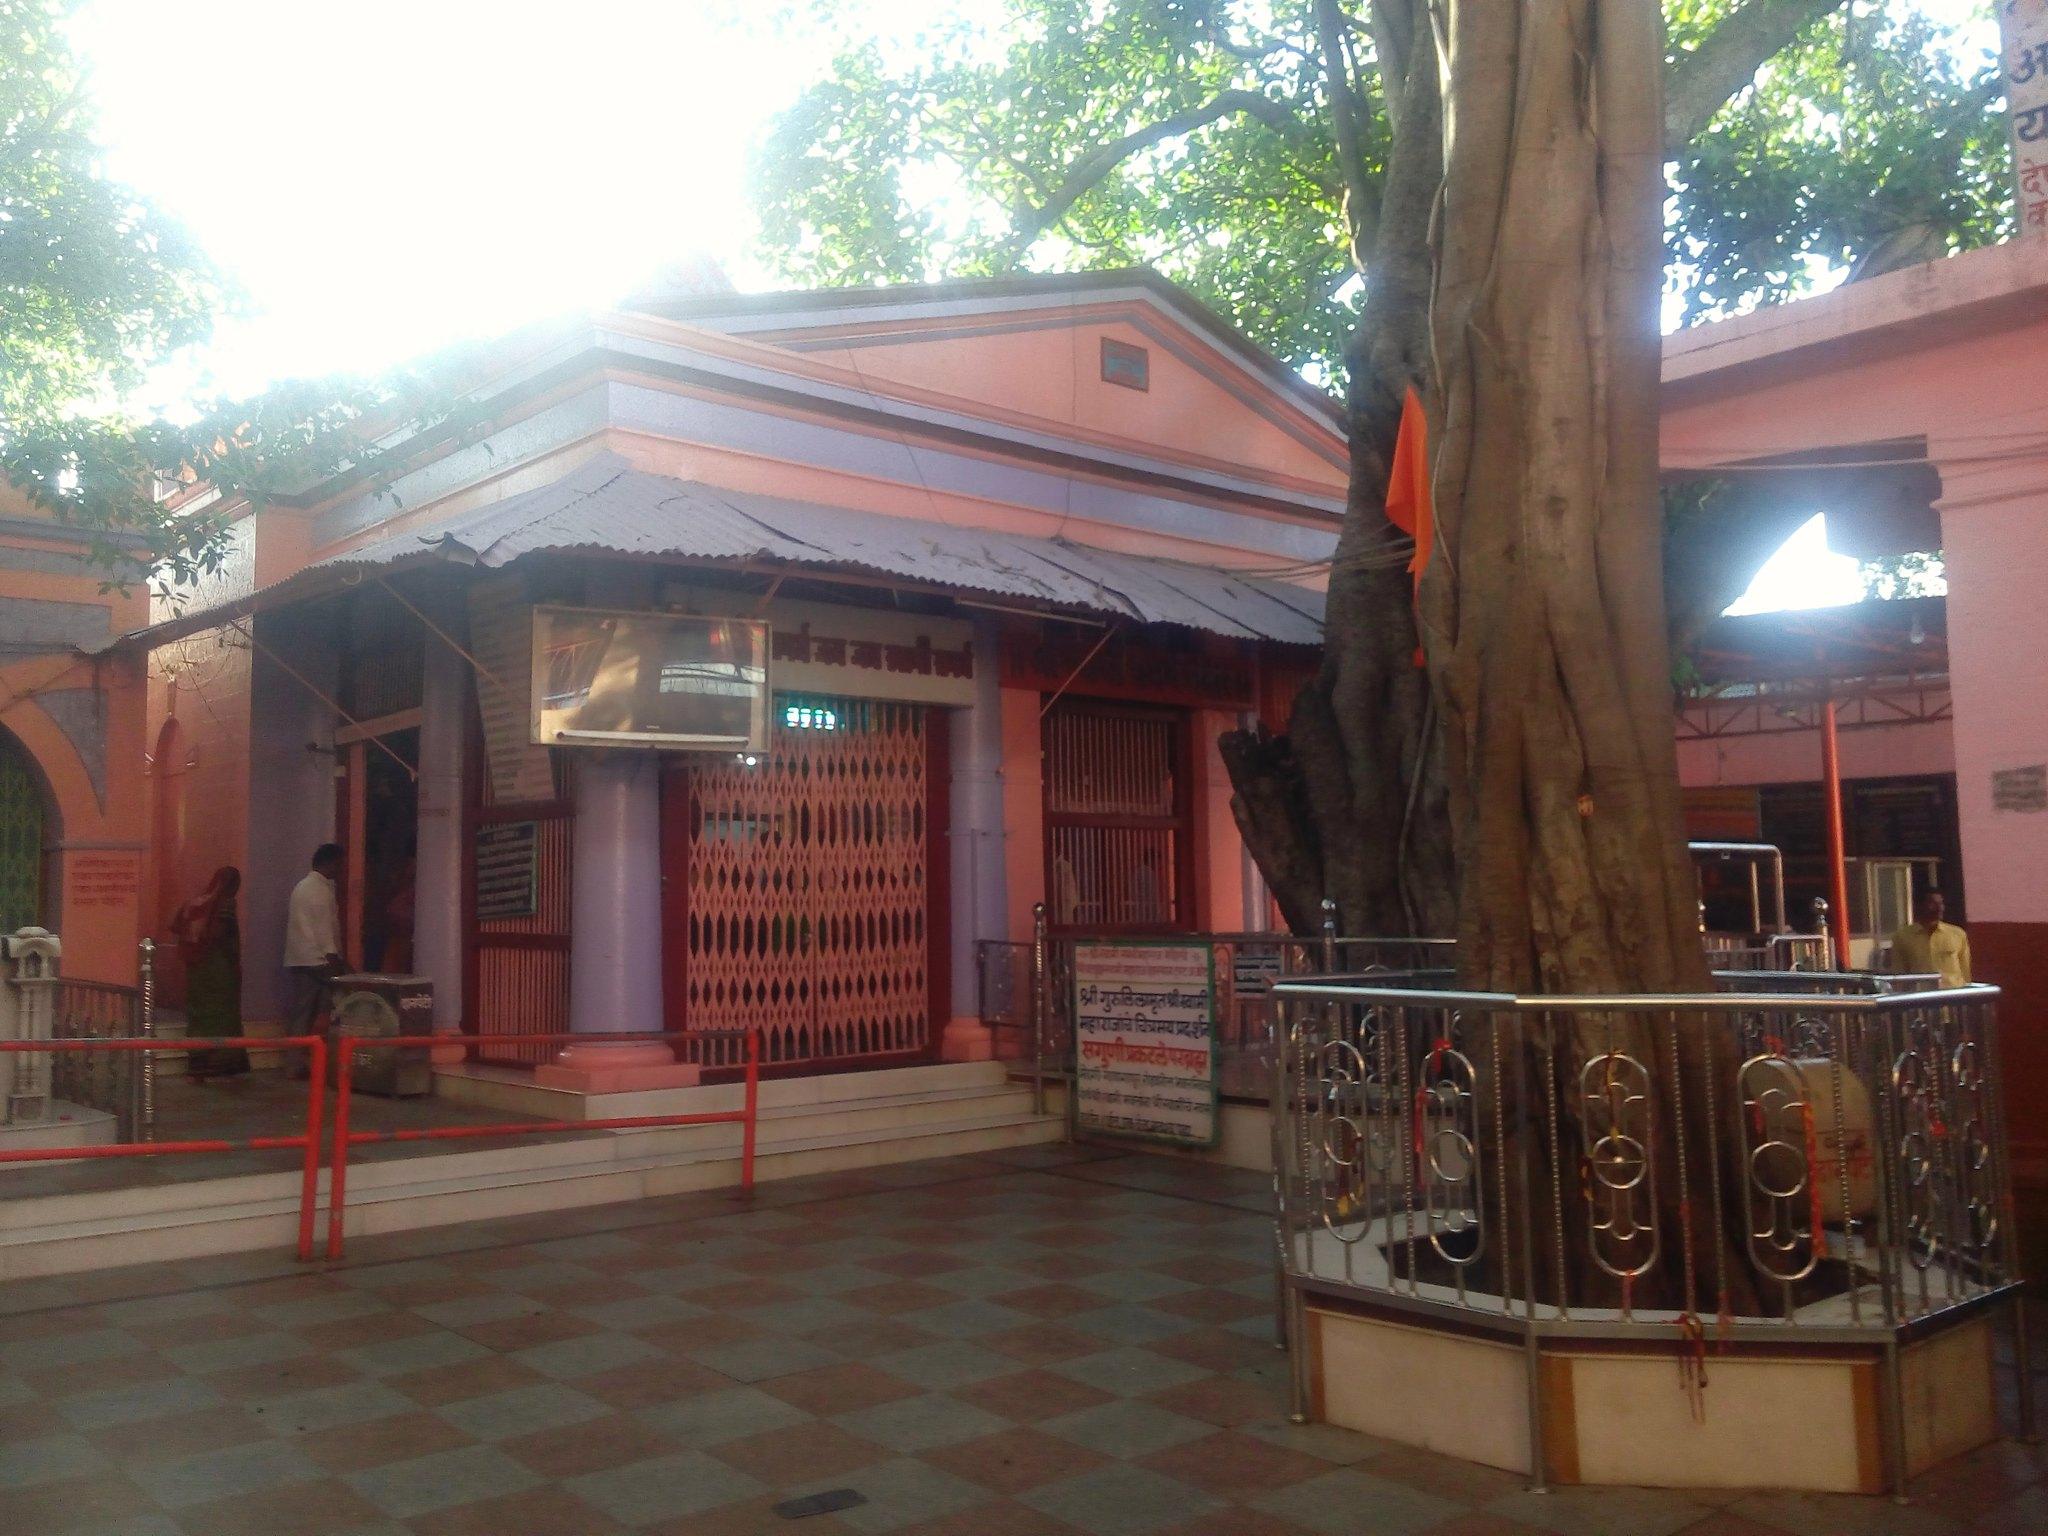 Akkalkot Swami Samarth Temple Information